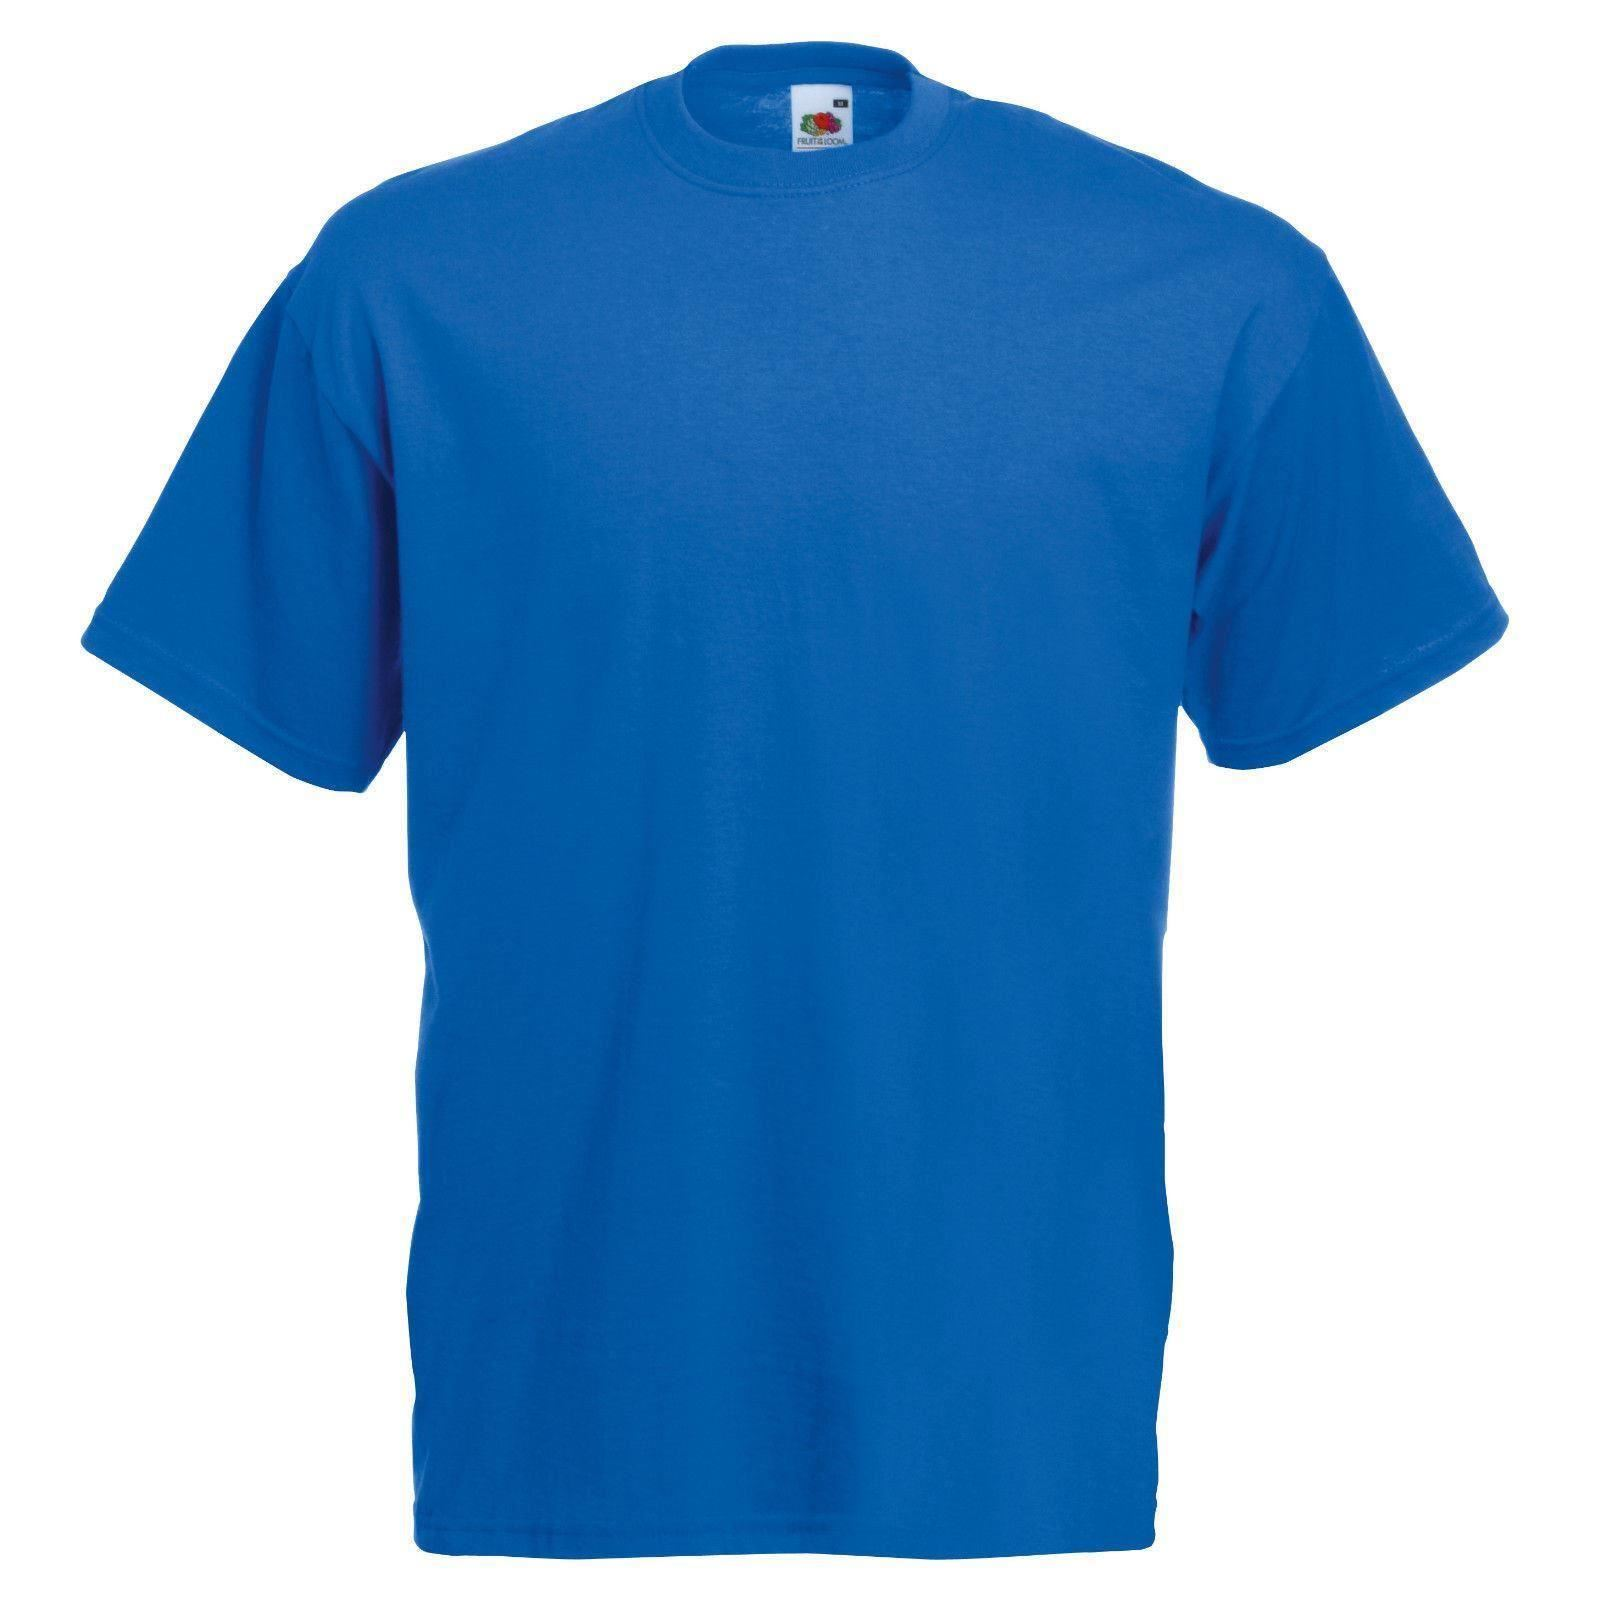 Royal blue t shirt template